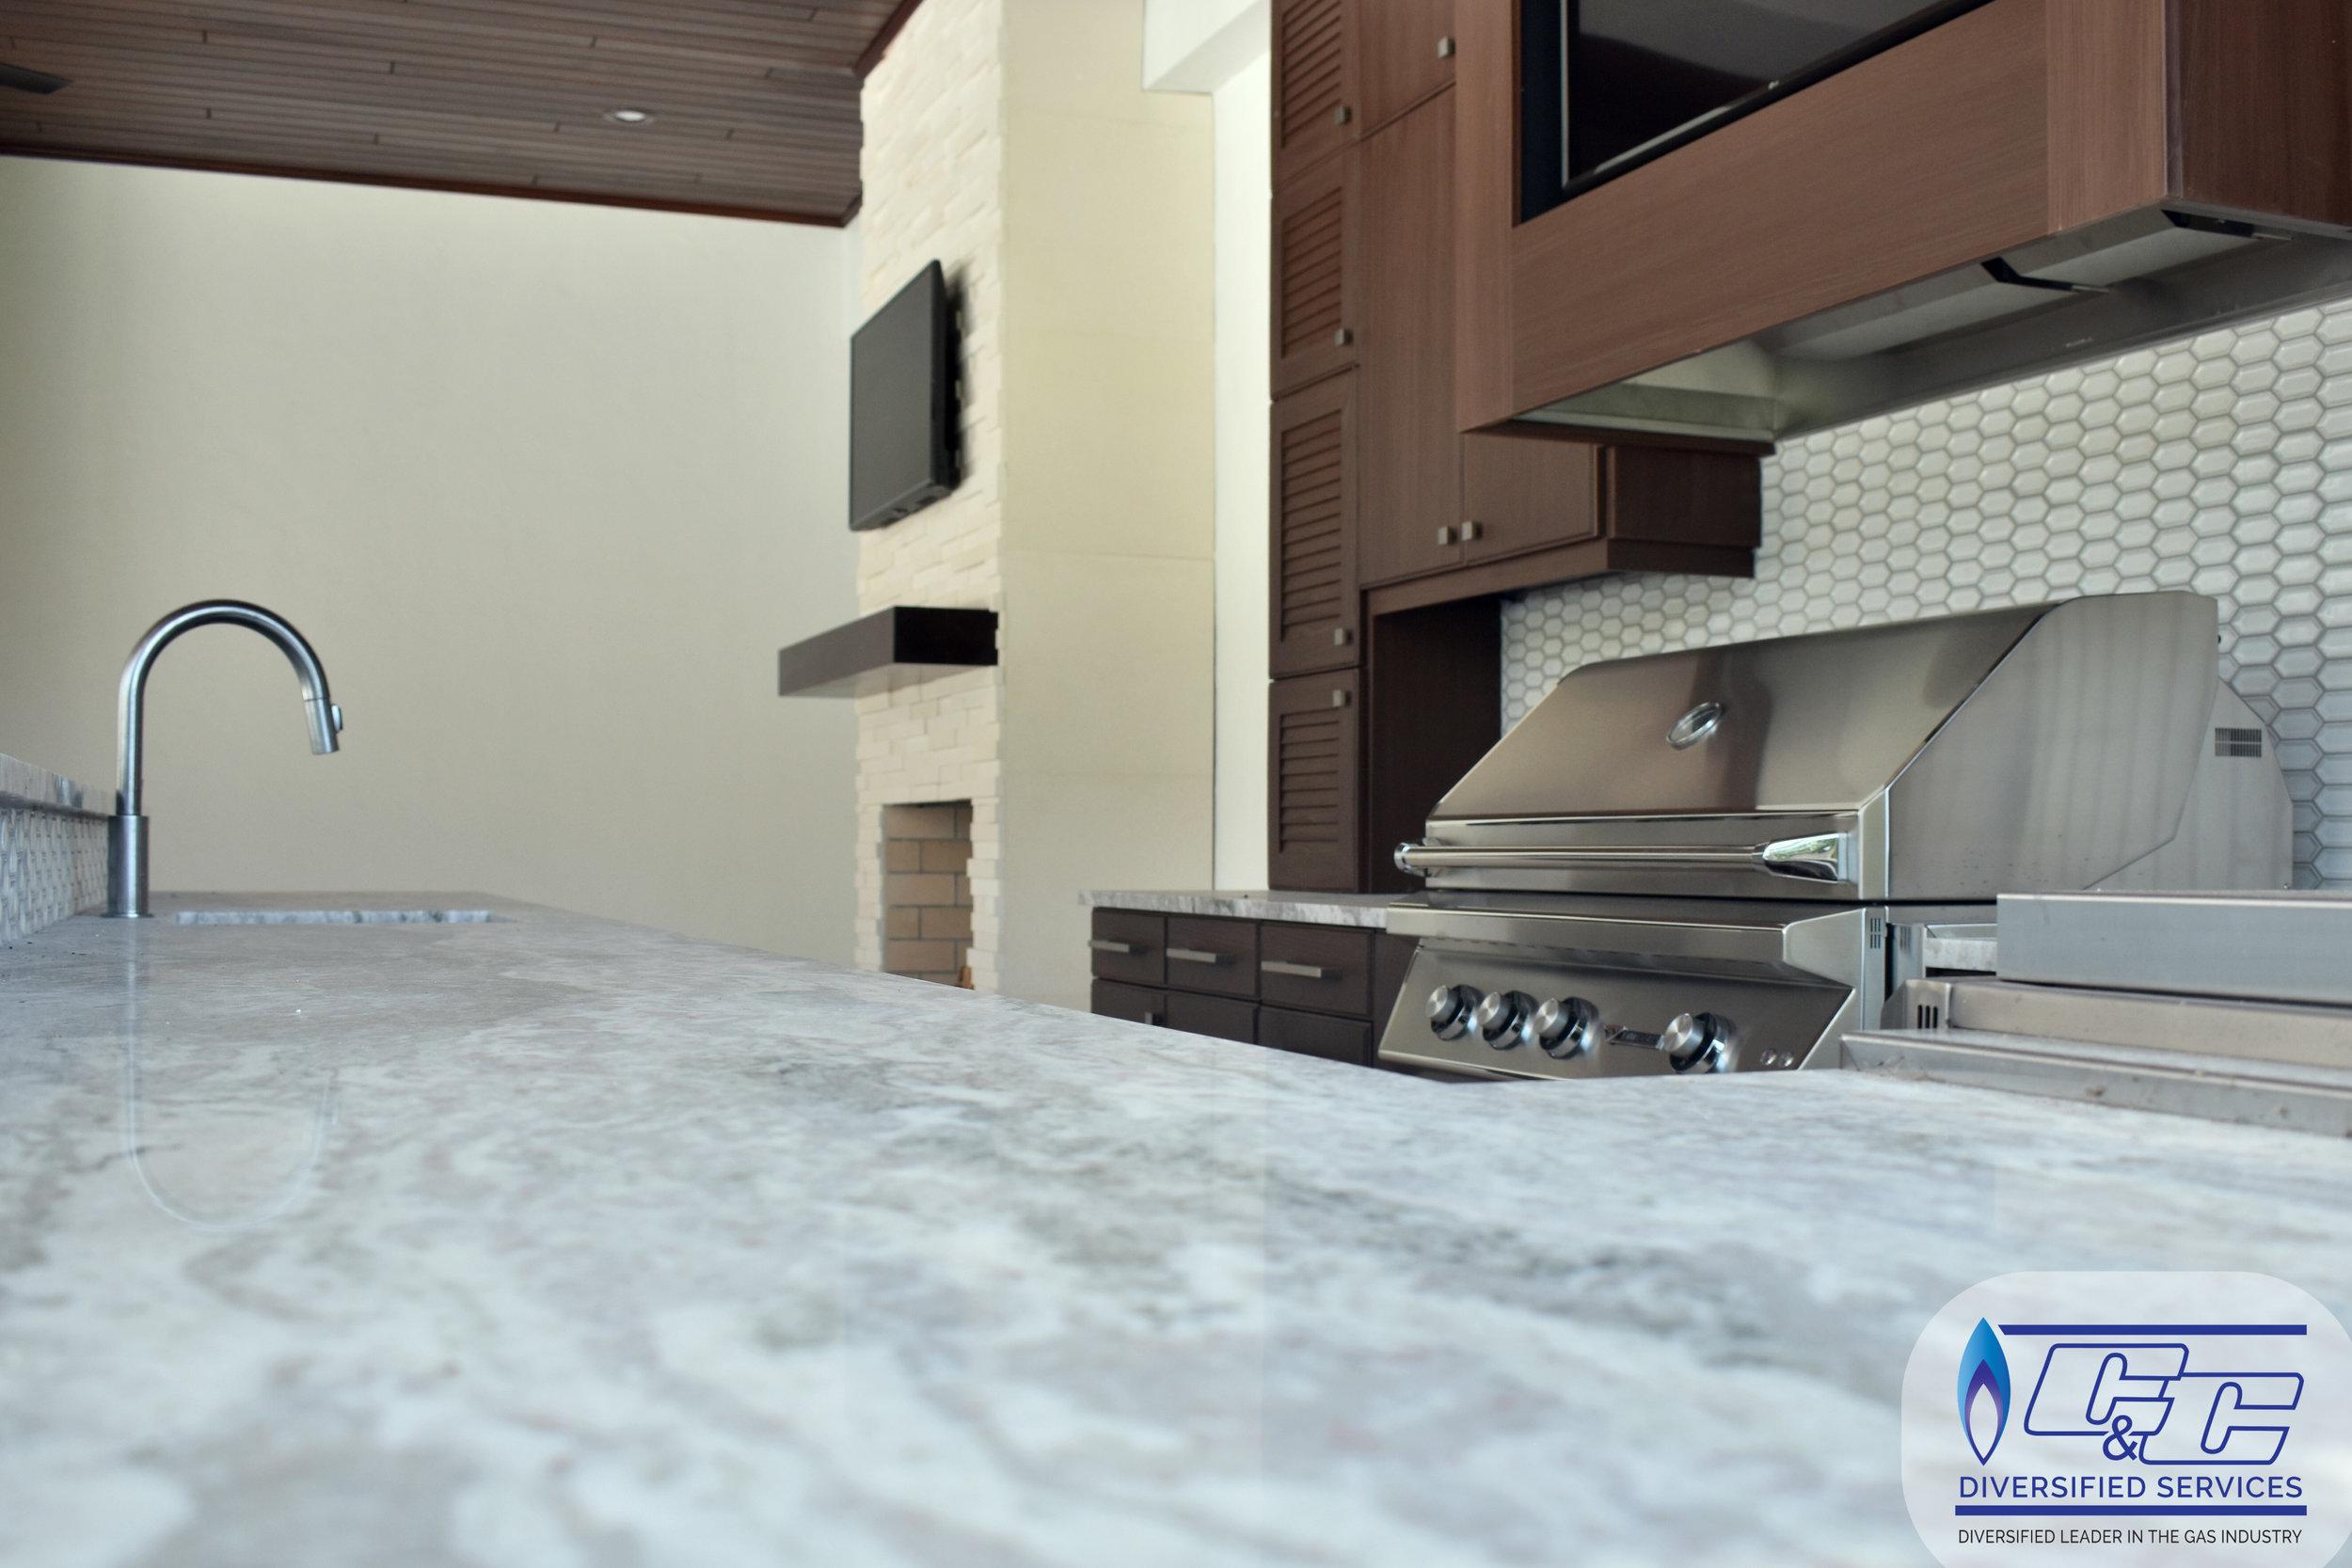 NatureKast Weatherproof Cabinetry - Granite Countertop with Backsplash